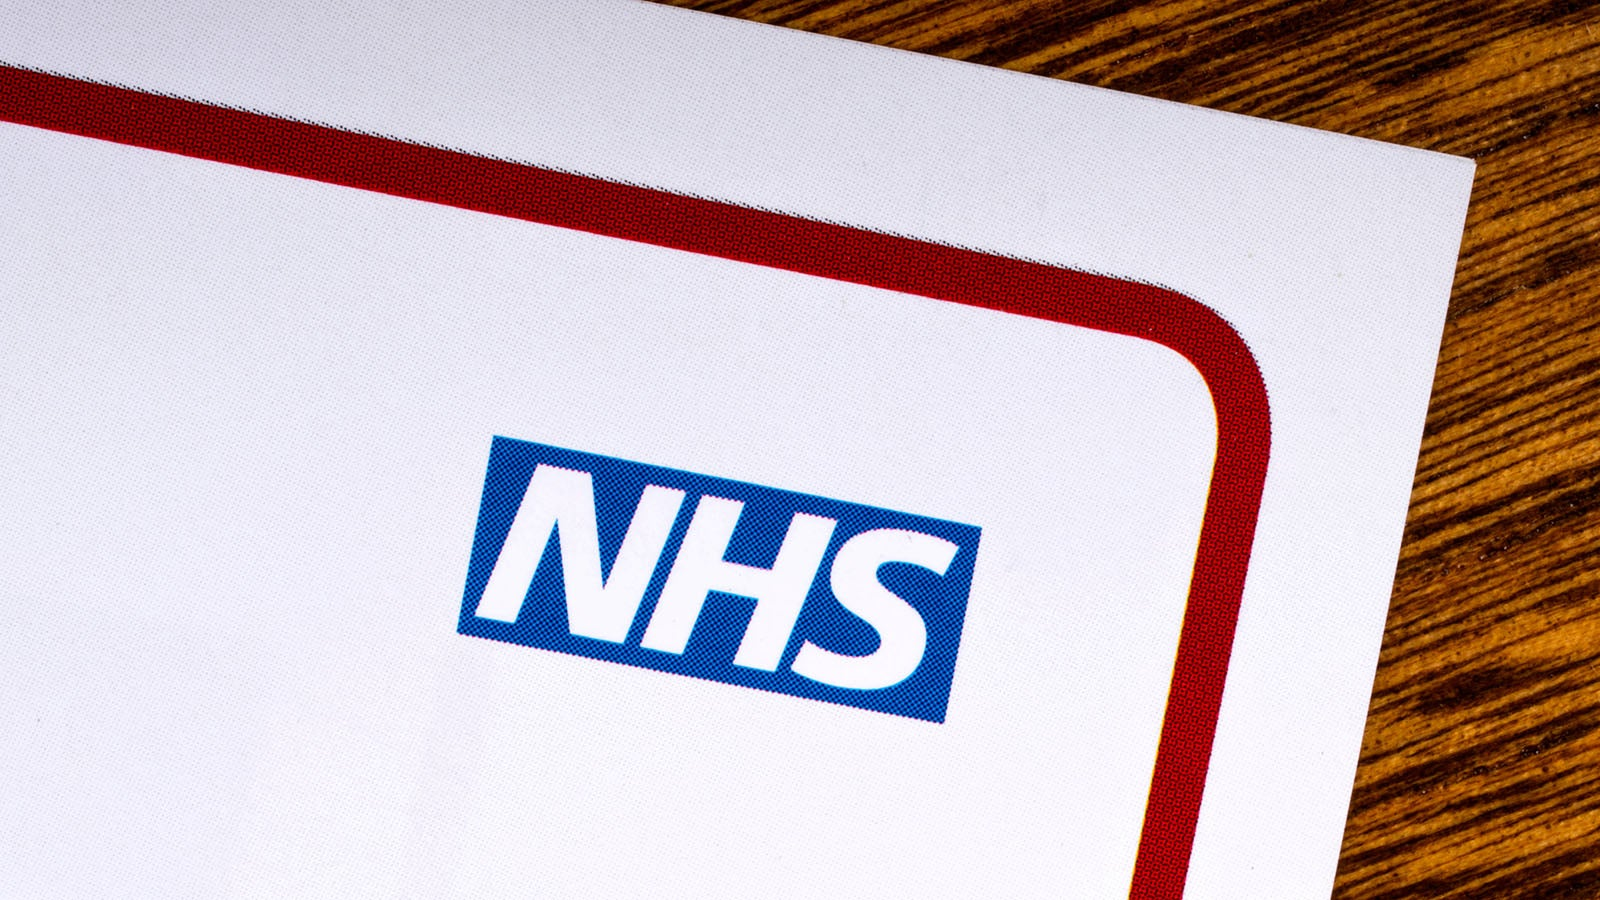 Image of NHS logo on letterhead